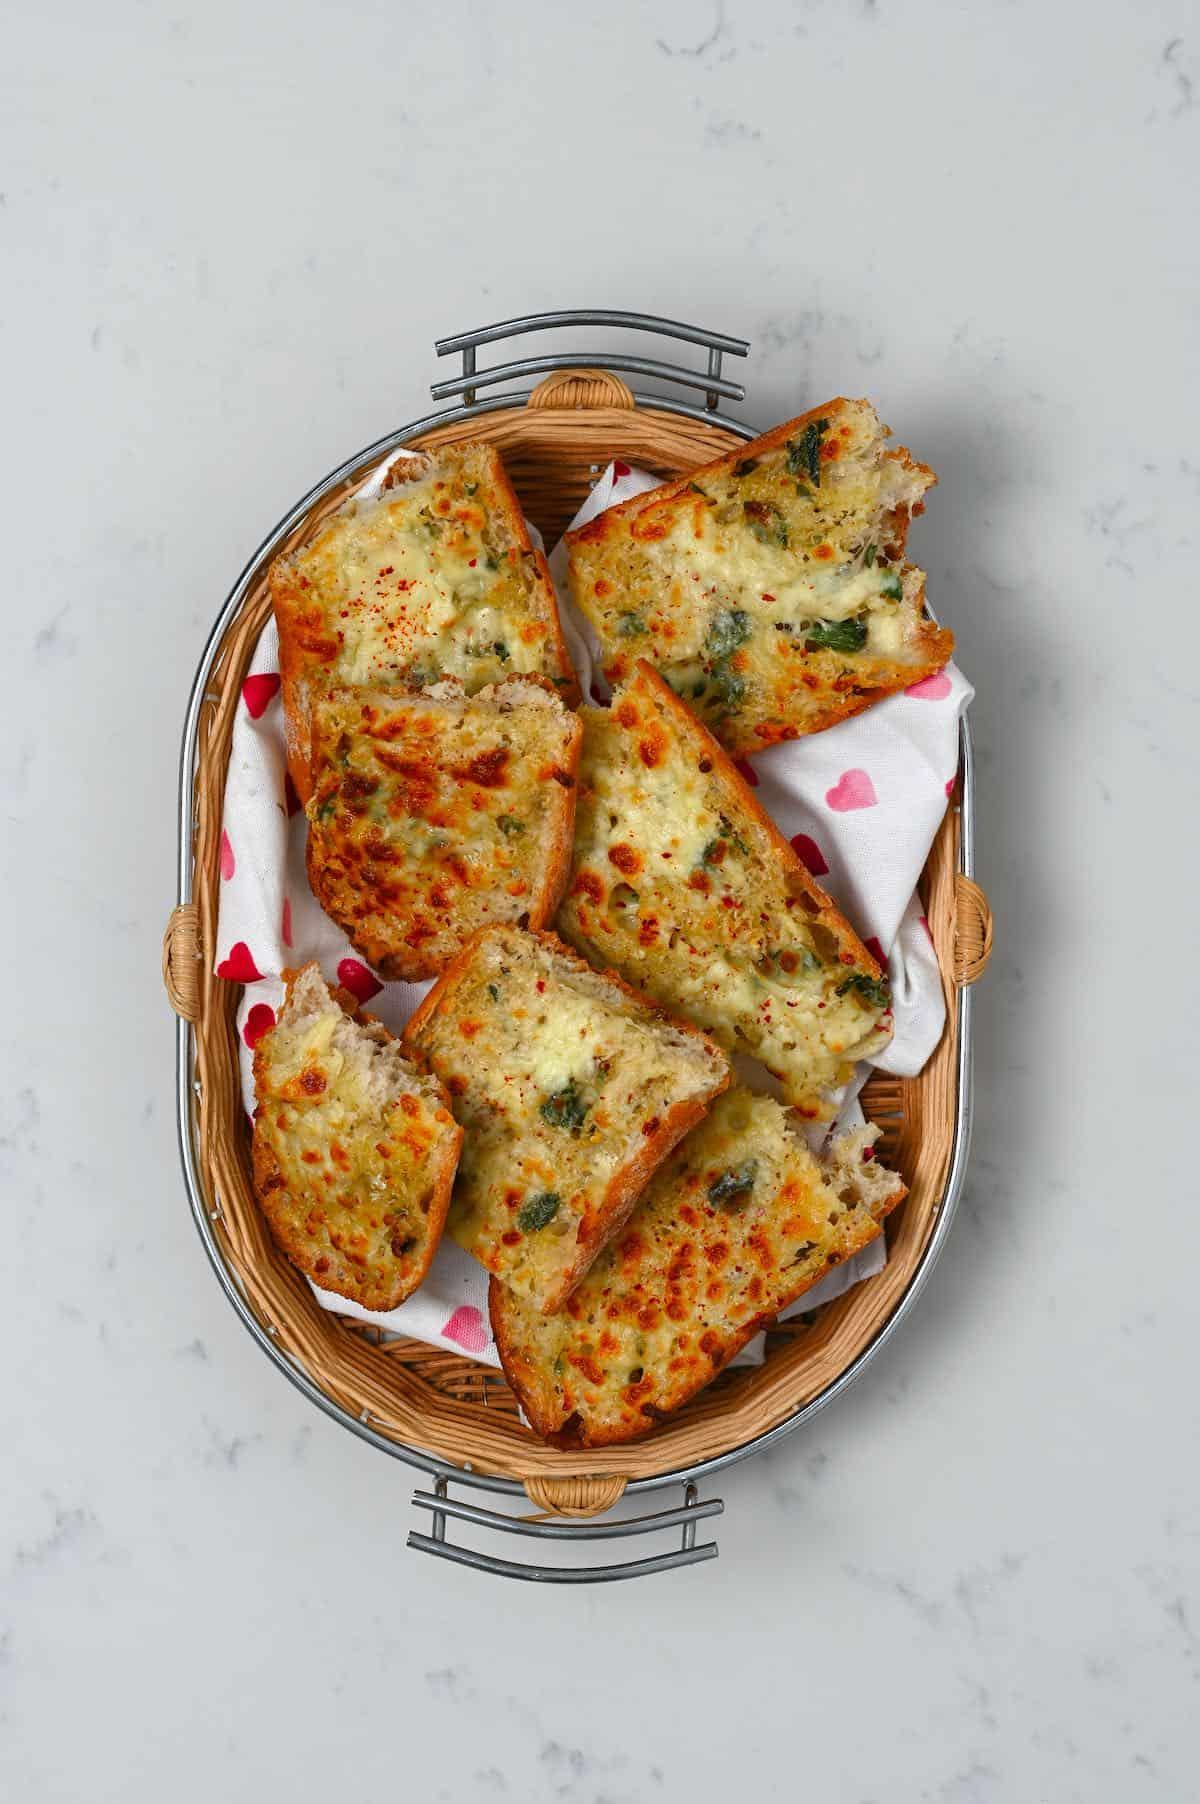 Homemade cheese garlic bread